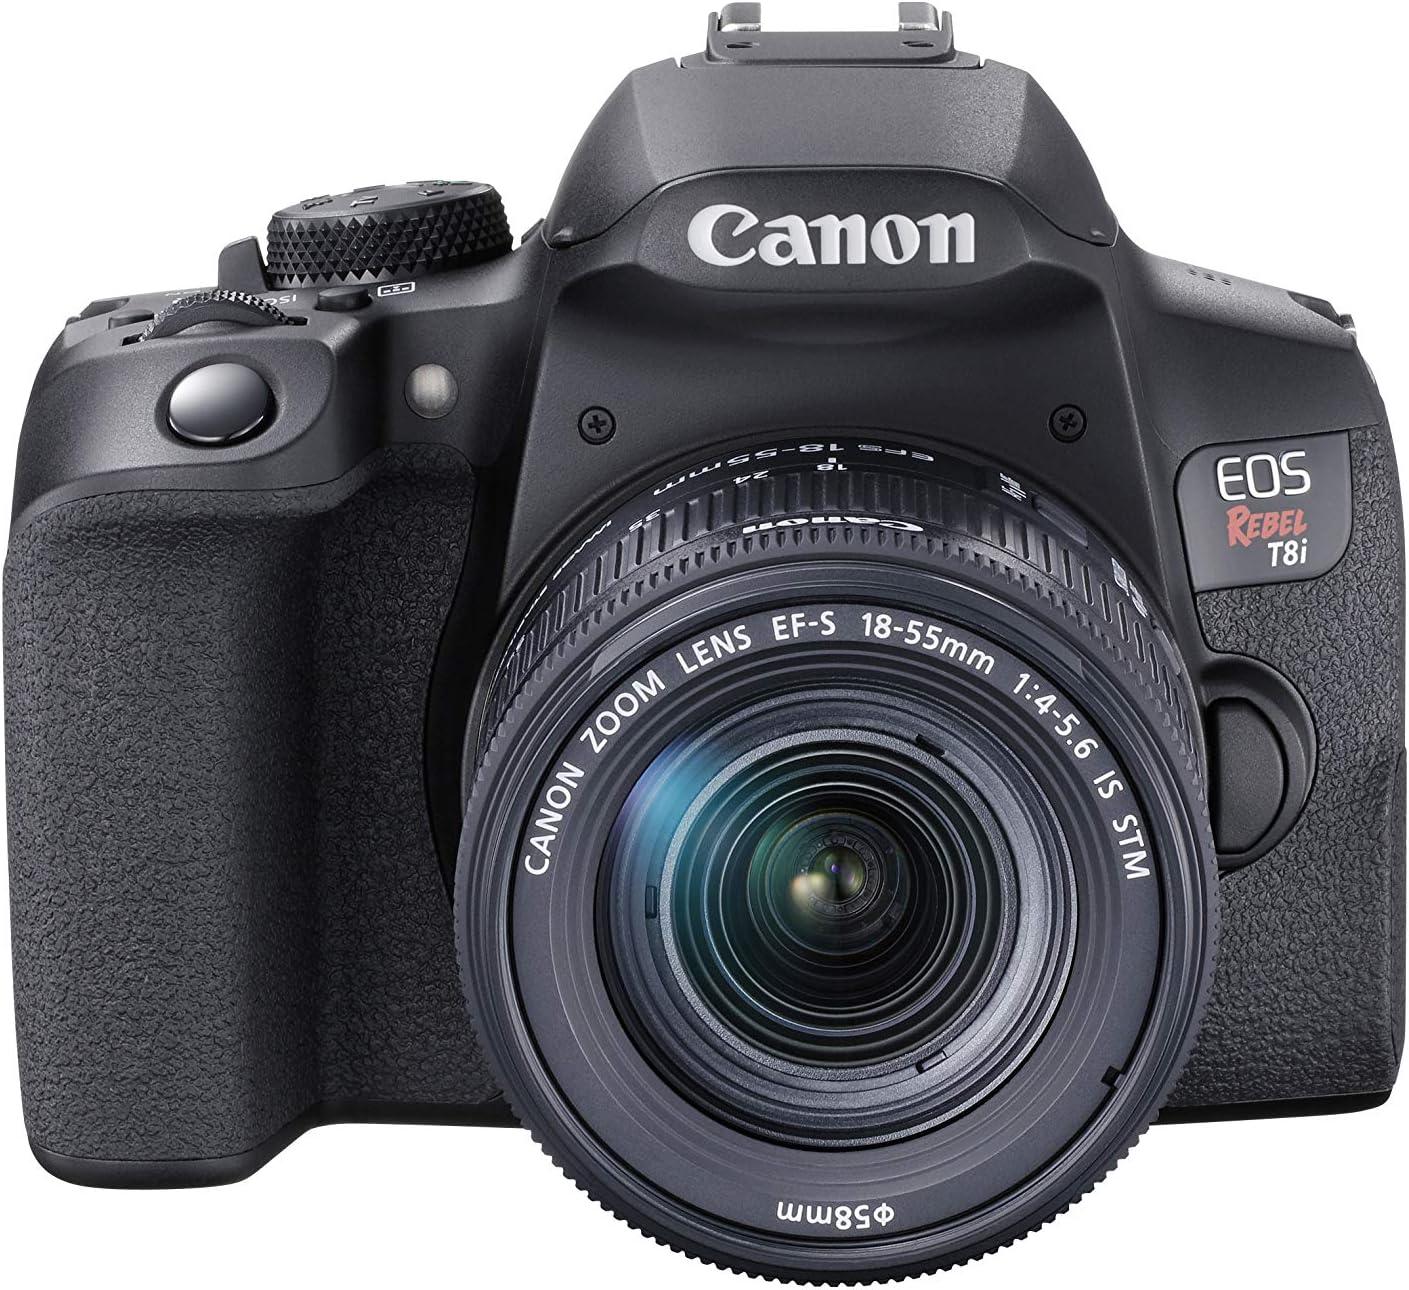 Canon EOS Rebel T8i Large-scale sale EF-S 18-55mm STM Black Kit Lens Excellence is